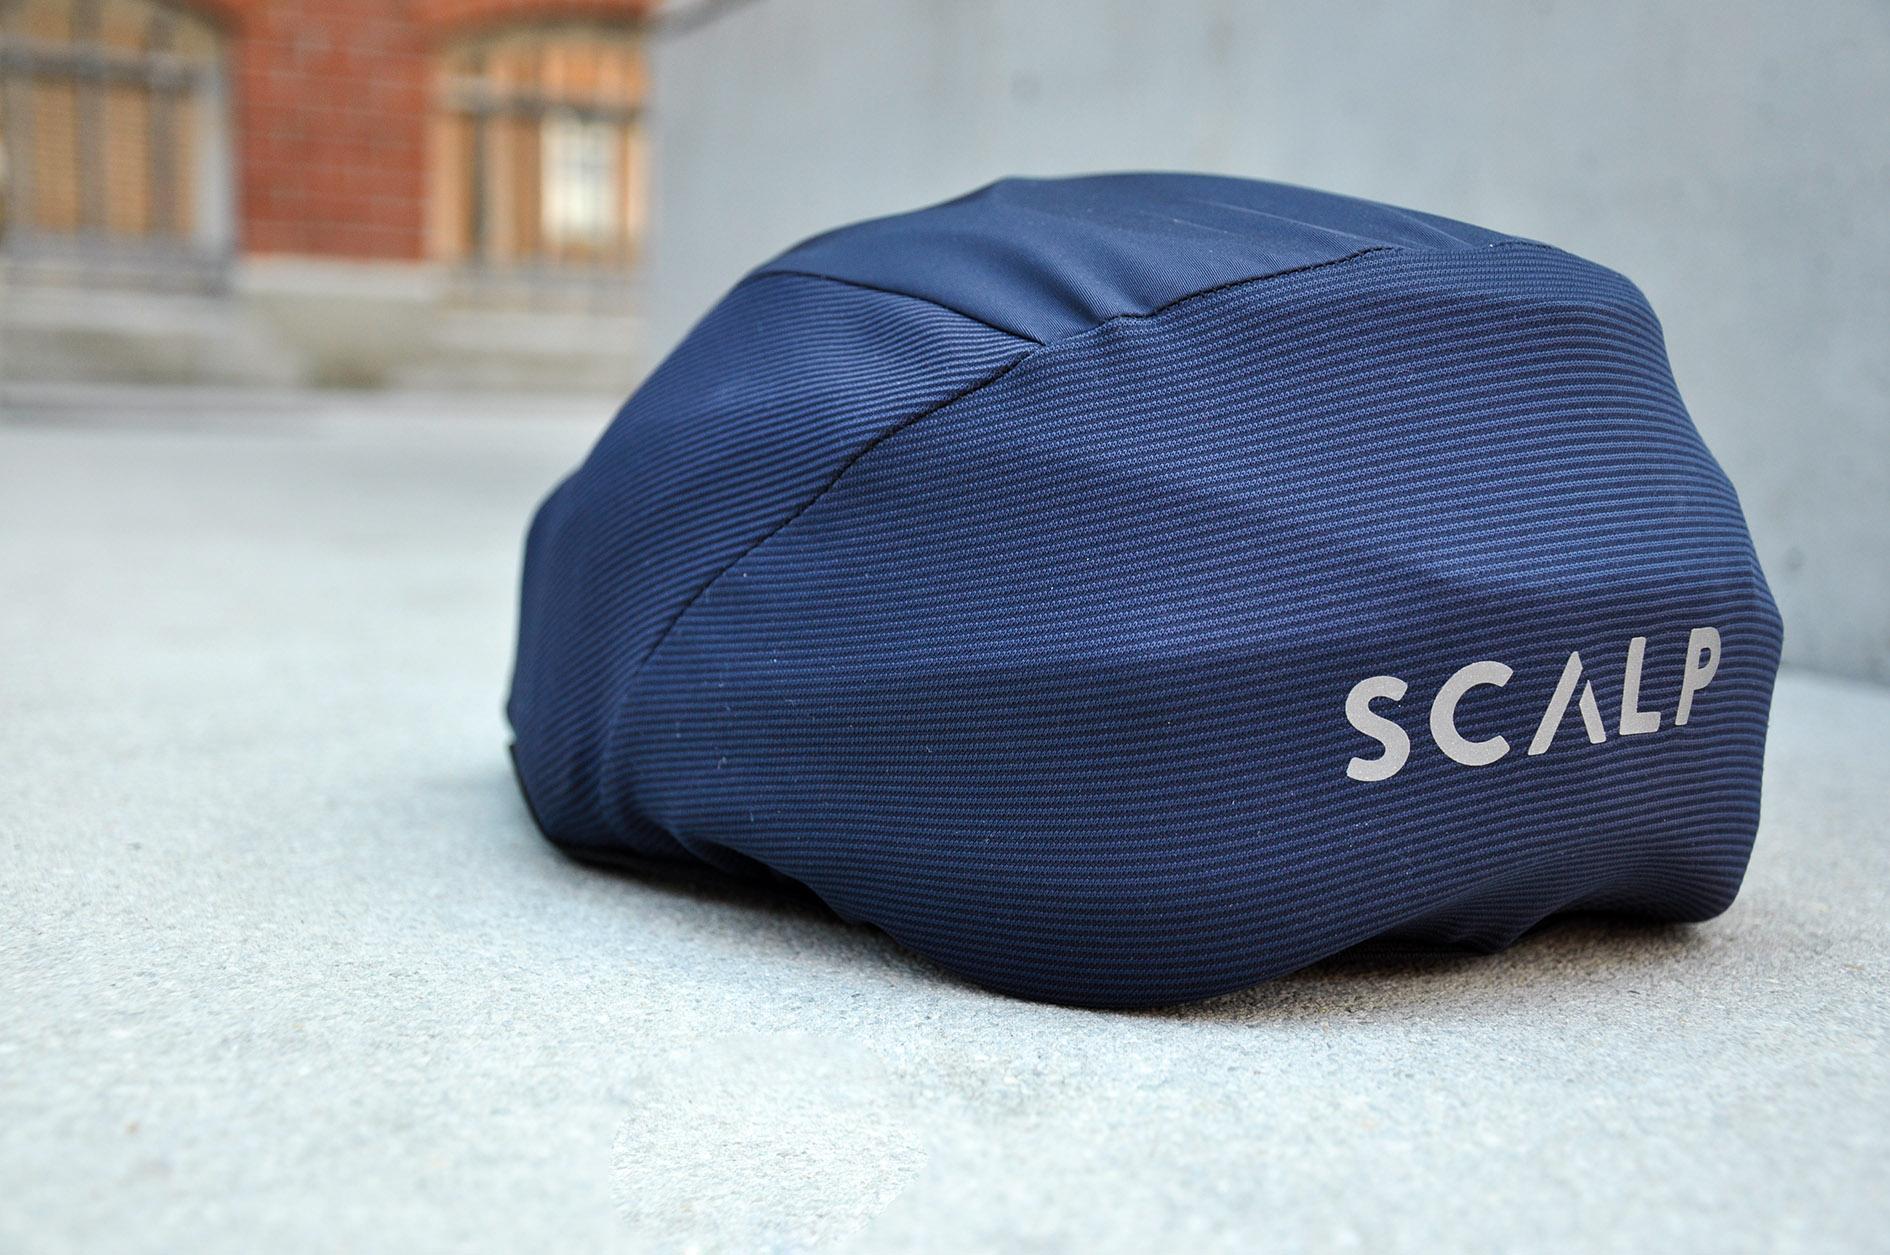 scalp fahrradhelm cover